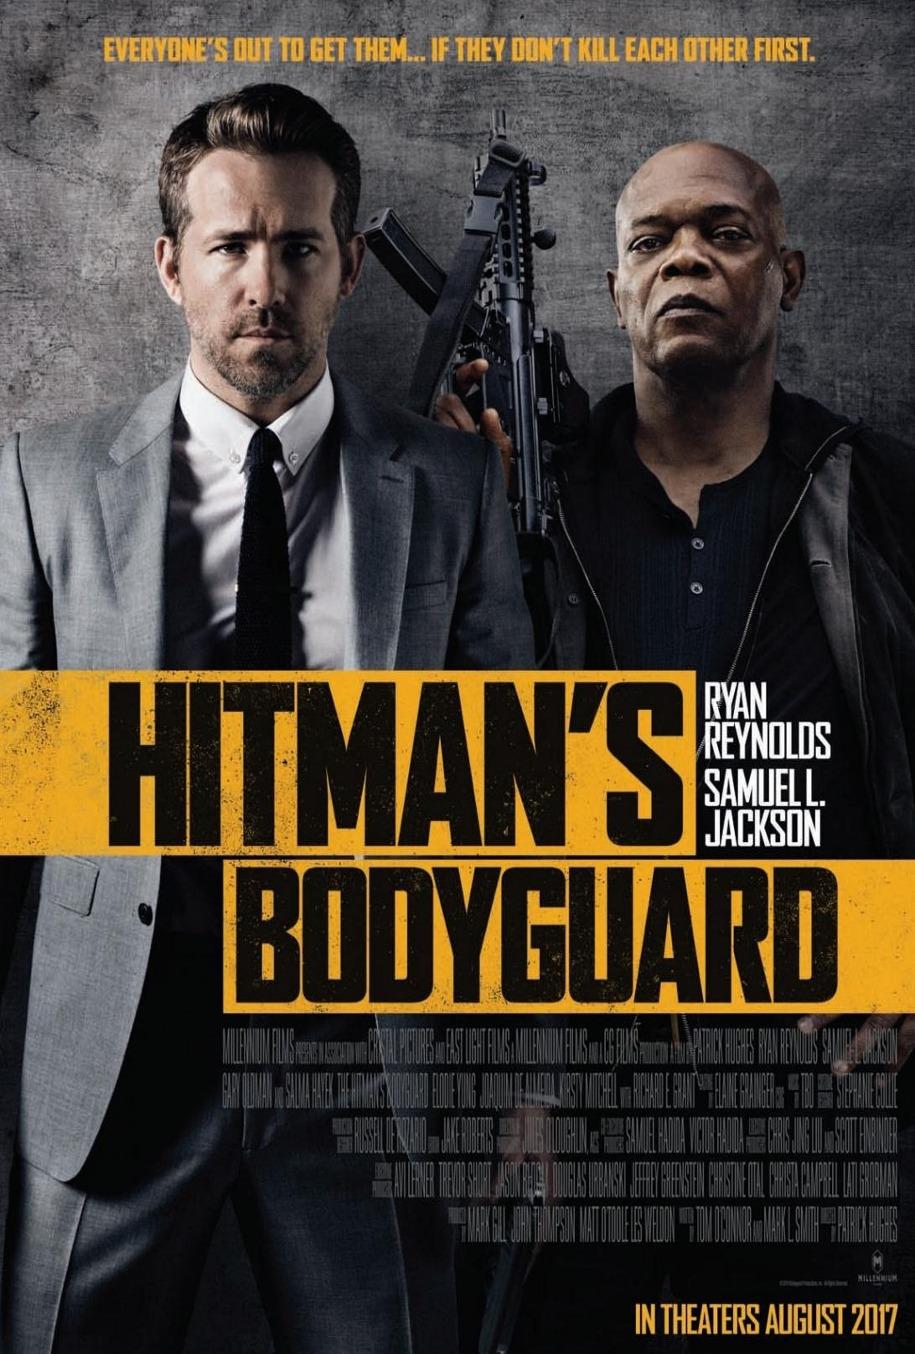 The Hitman S Bodyguard Dvd Release Date Redbox Netflix Itunes Amazon